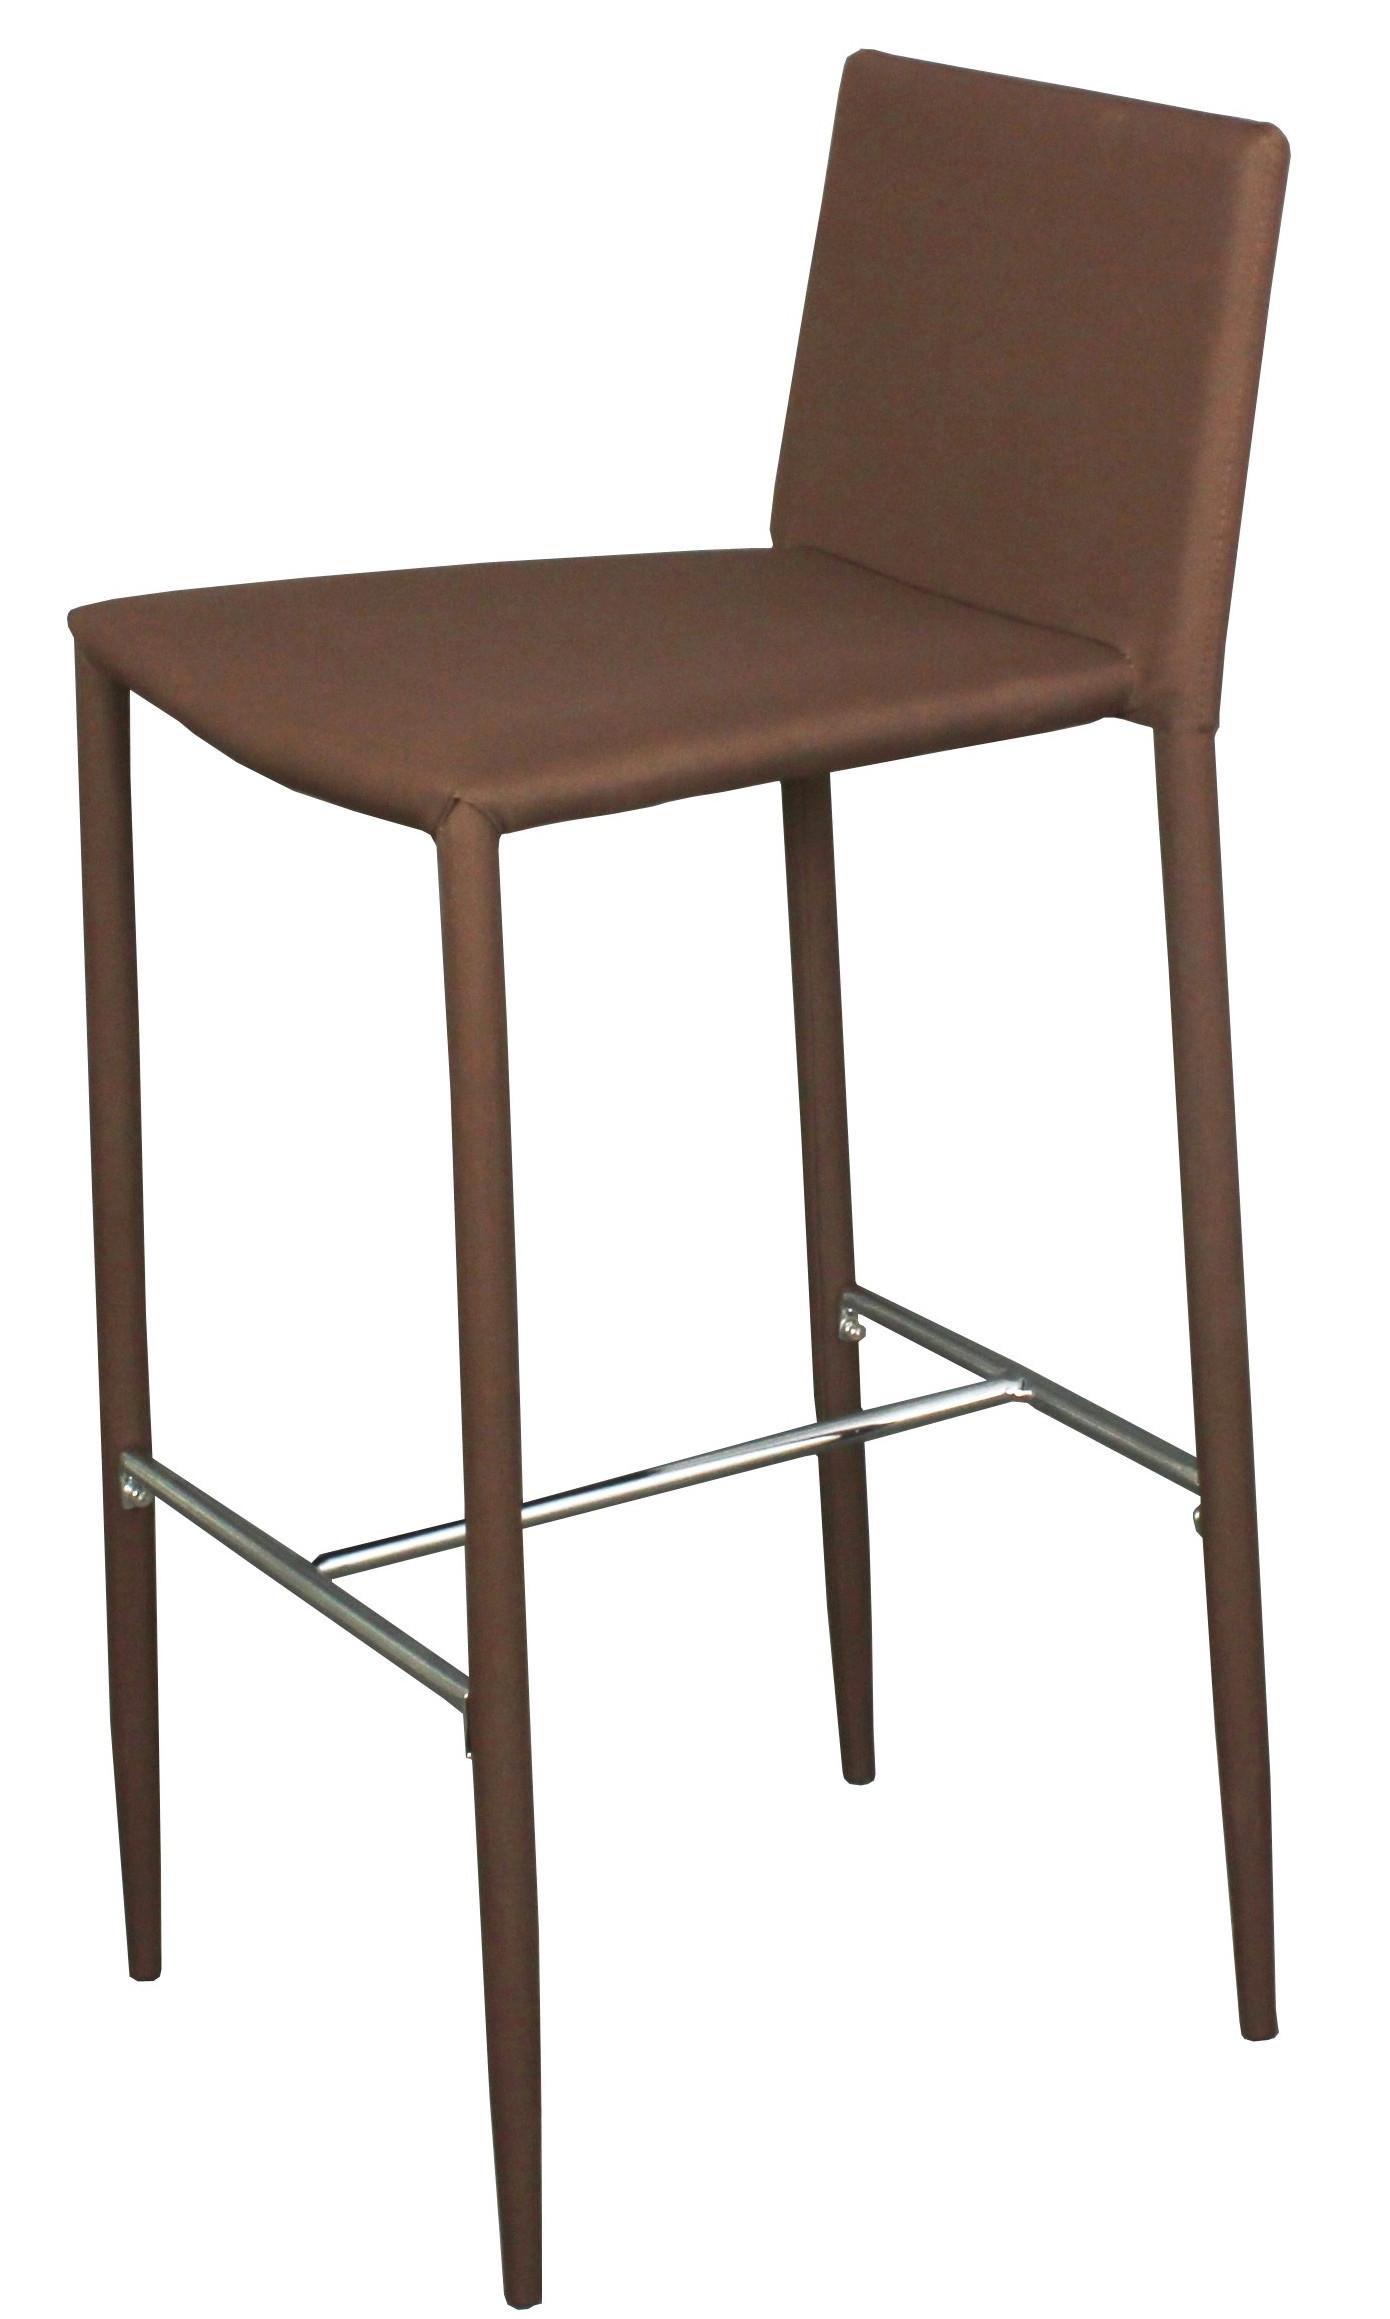 chaise haute tissu marron vunka. Black Bedroom Furniture Sets. Home Design Ideas